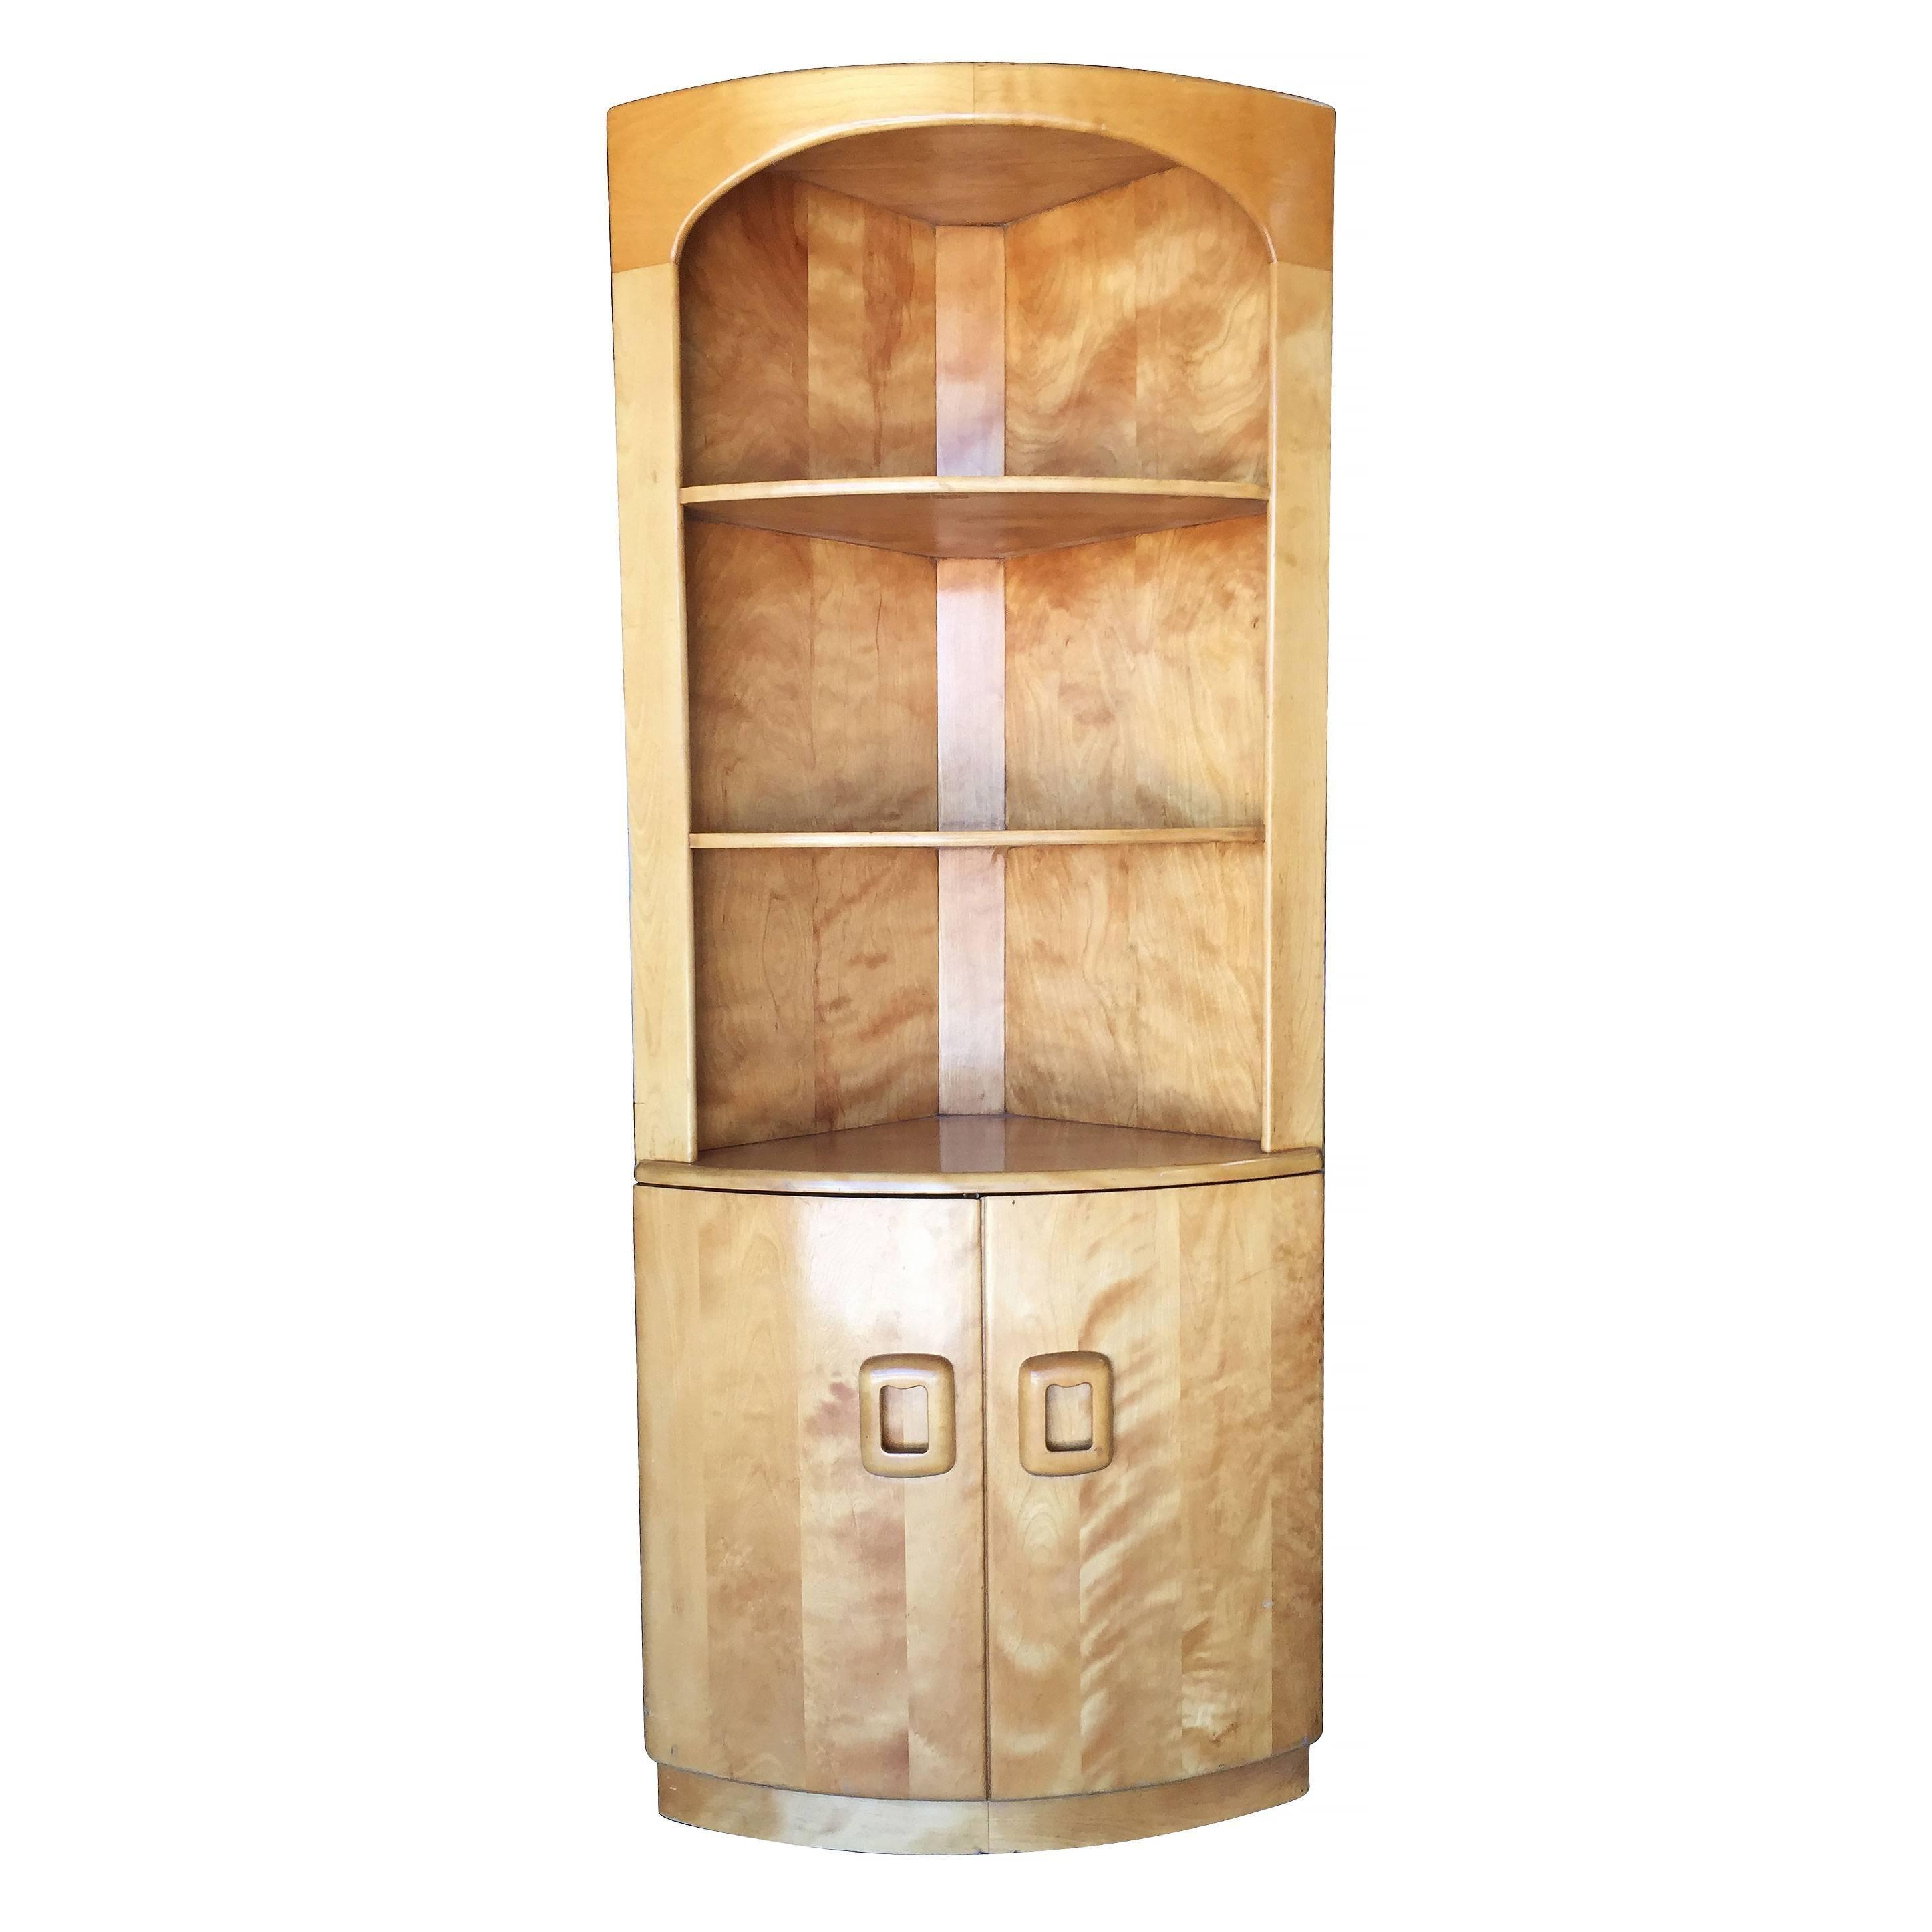 rare pair heywood wakefield corner cabinets at 1stdibs set of 2 heywood wakefield nightstands end tables mid century modern champagne